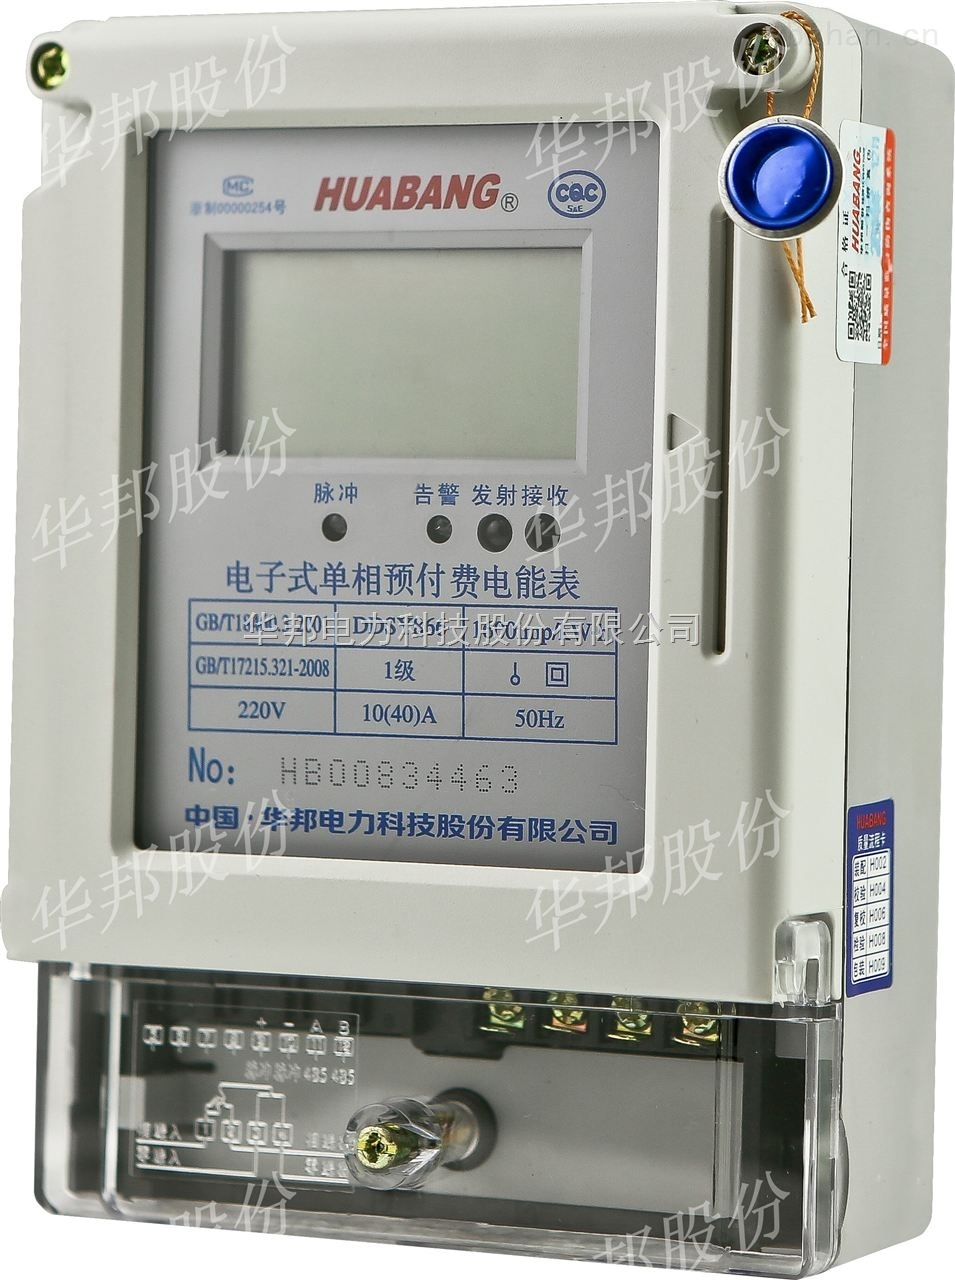 DDSY866-适宜普通居民使用的单相预付费电度表